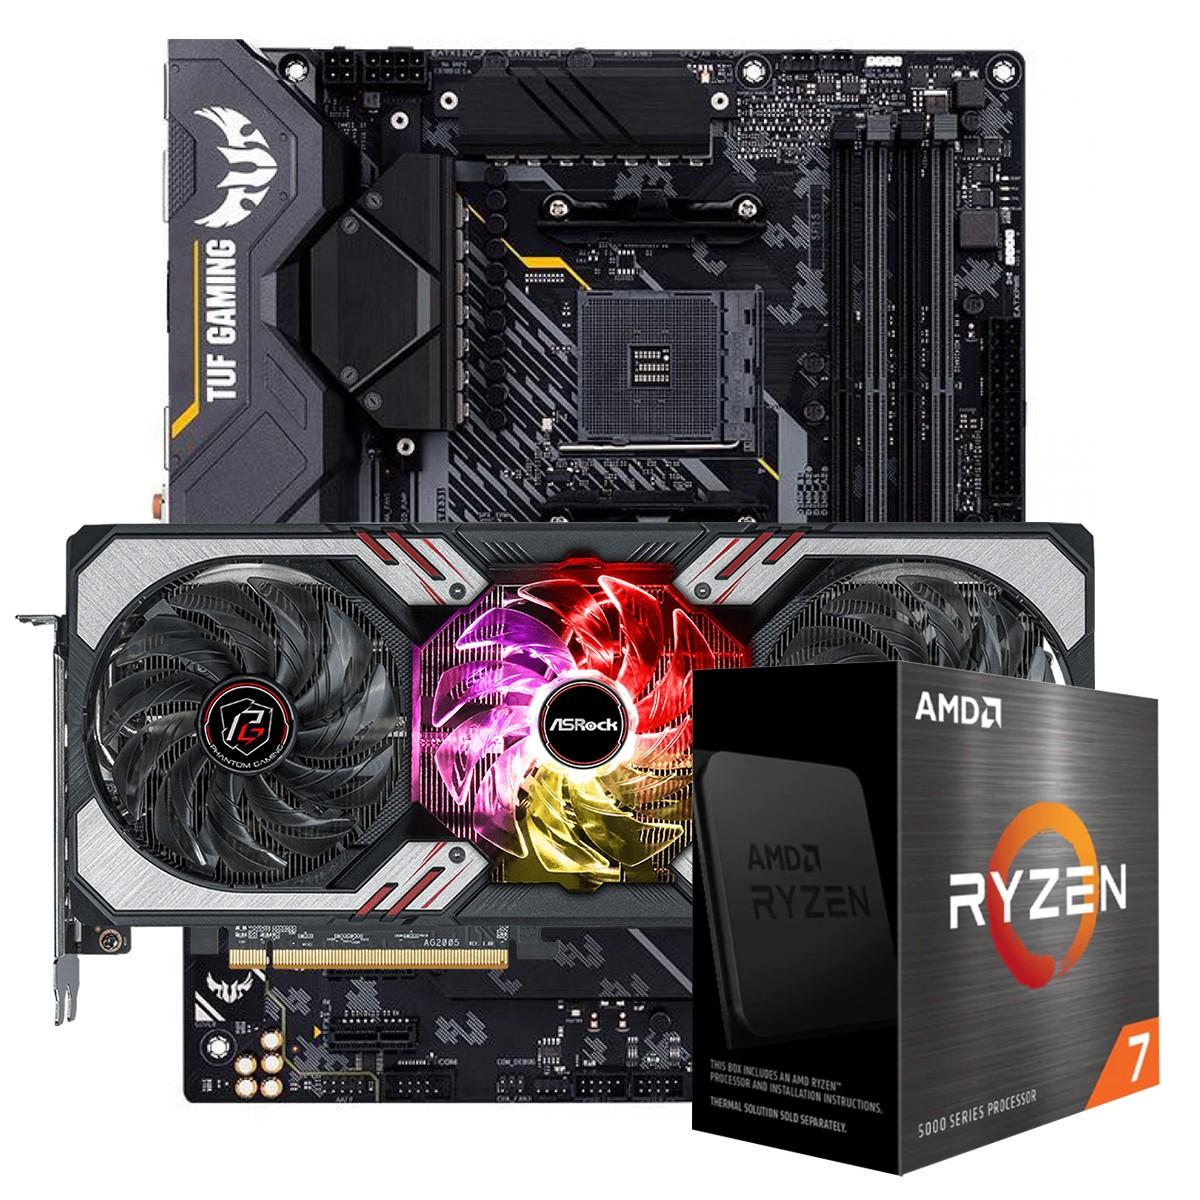 Kit Upgrade ASRock Radeon RX 6700 XT Phantom Gaming D OC + AMD Ryzen 7 5800X + ASUS TUF Gaming X570-Plus